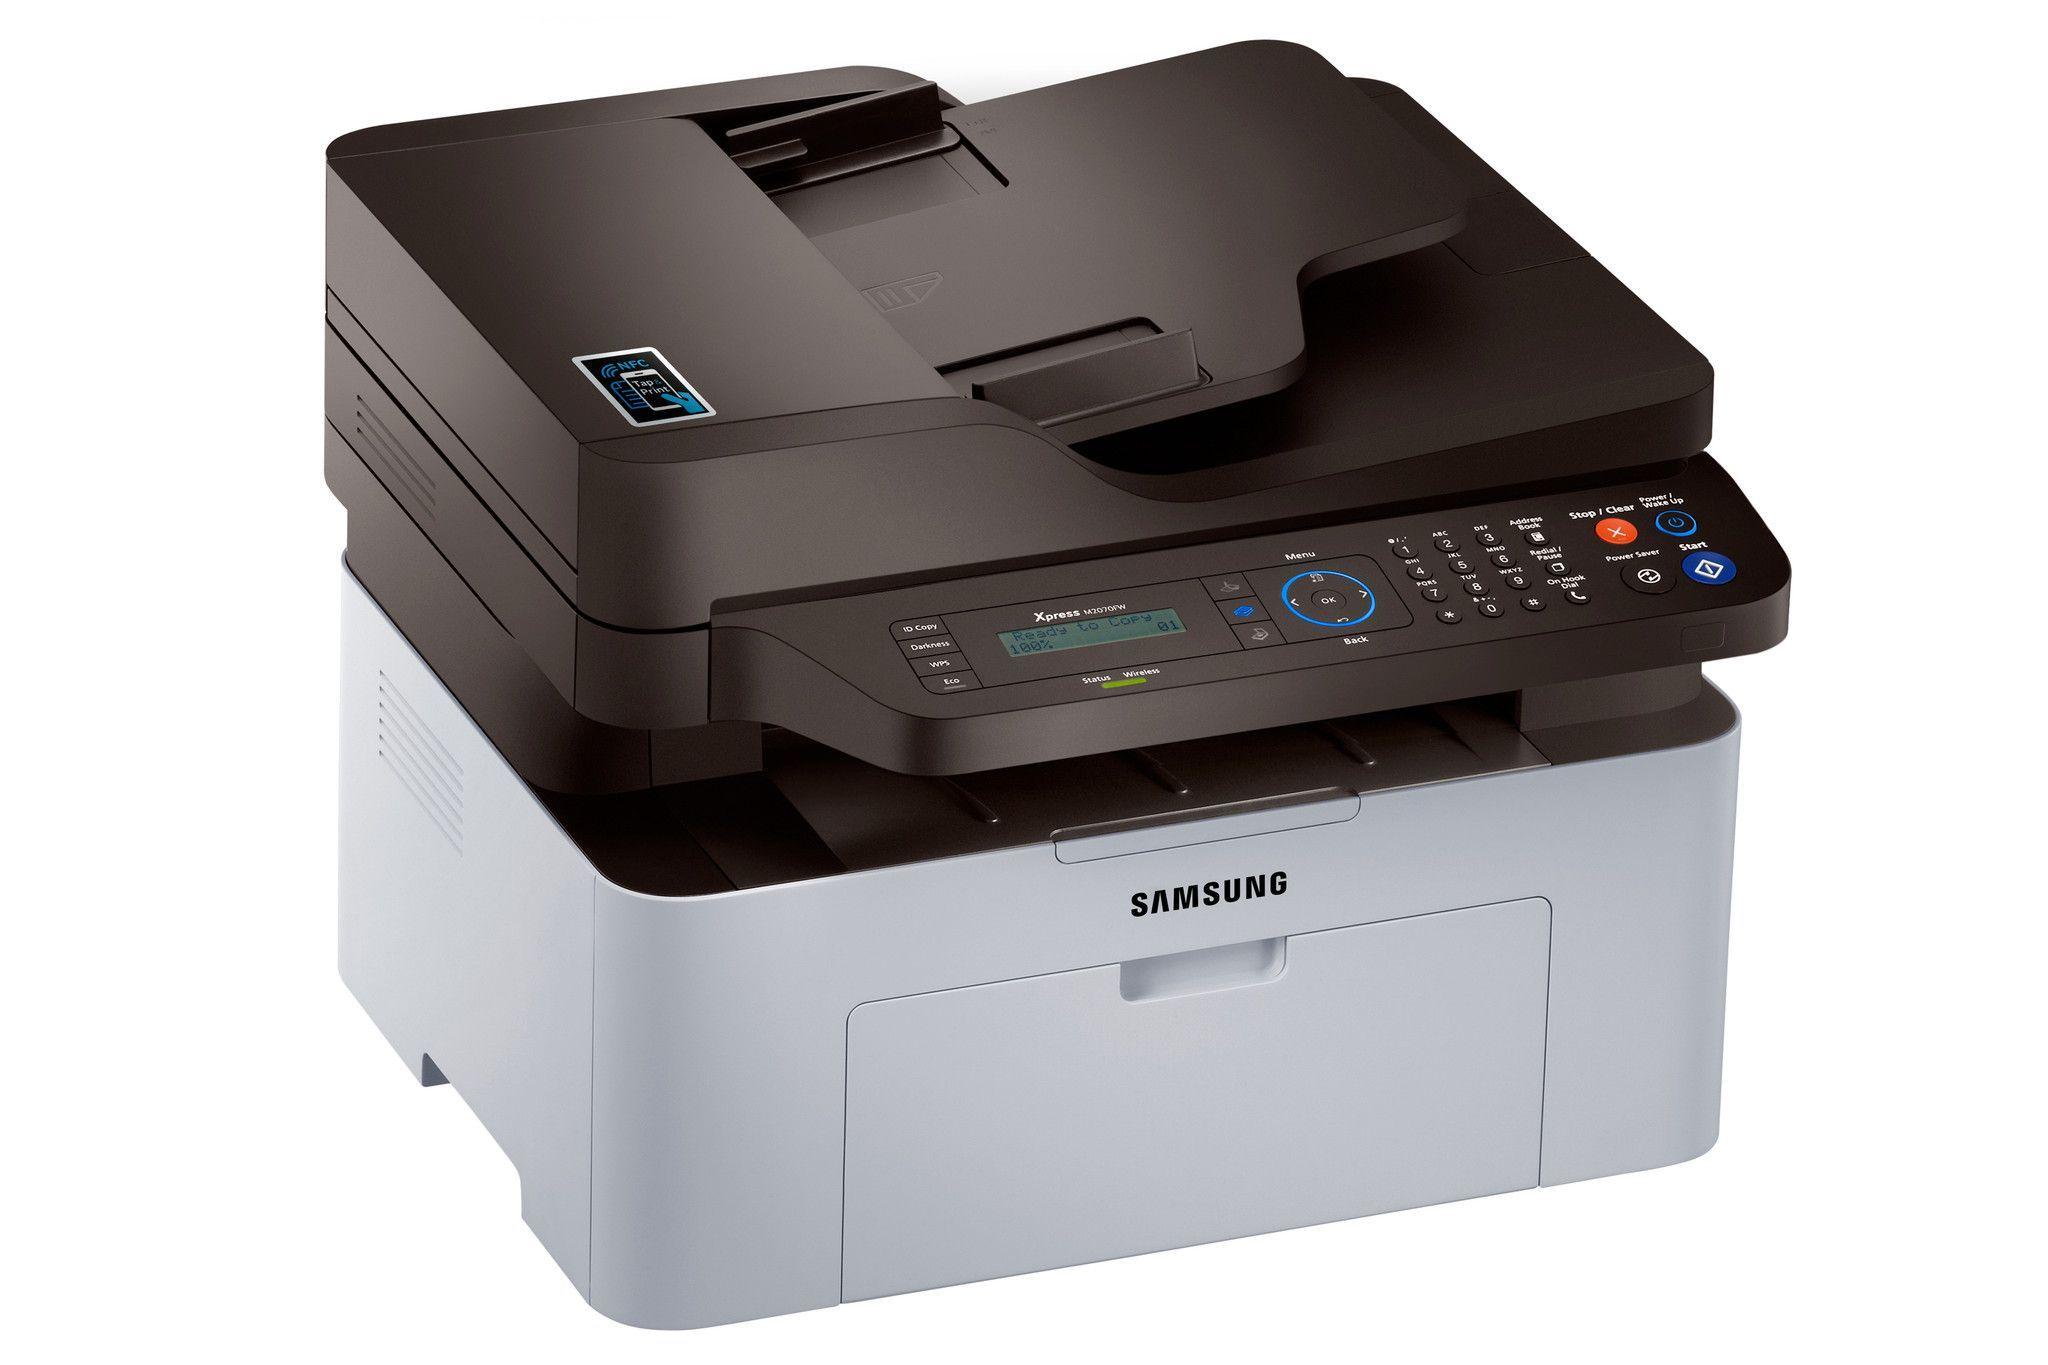 Monochrome Laser MFP Xpress - Samsung IT - SL-M2070FW/XAA